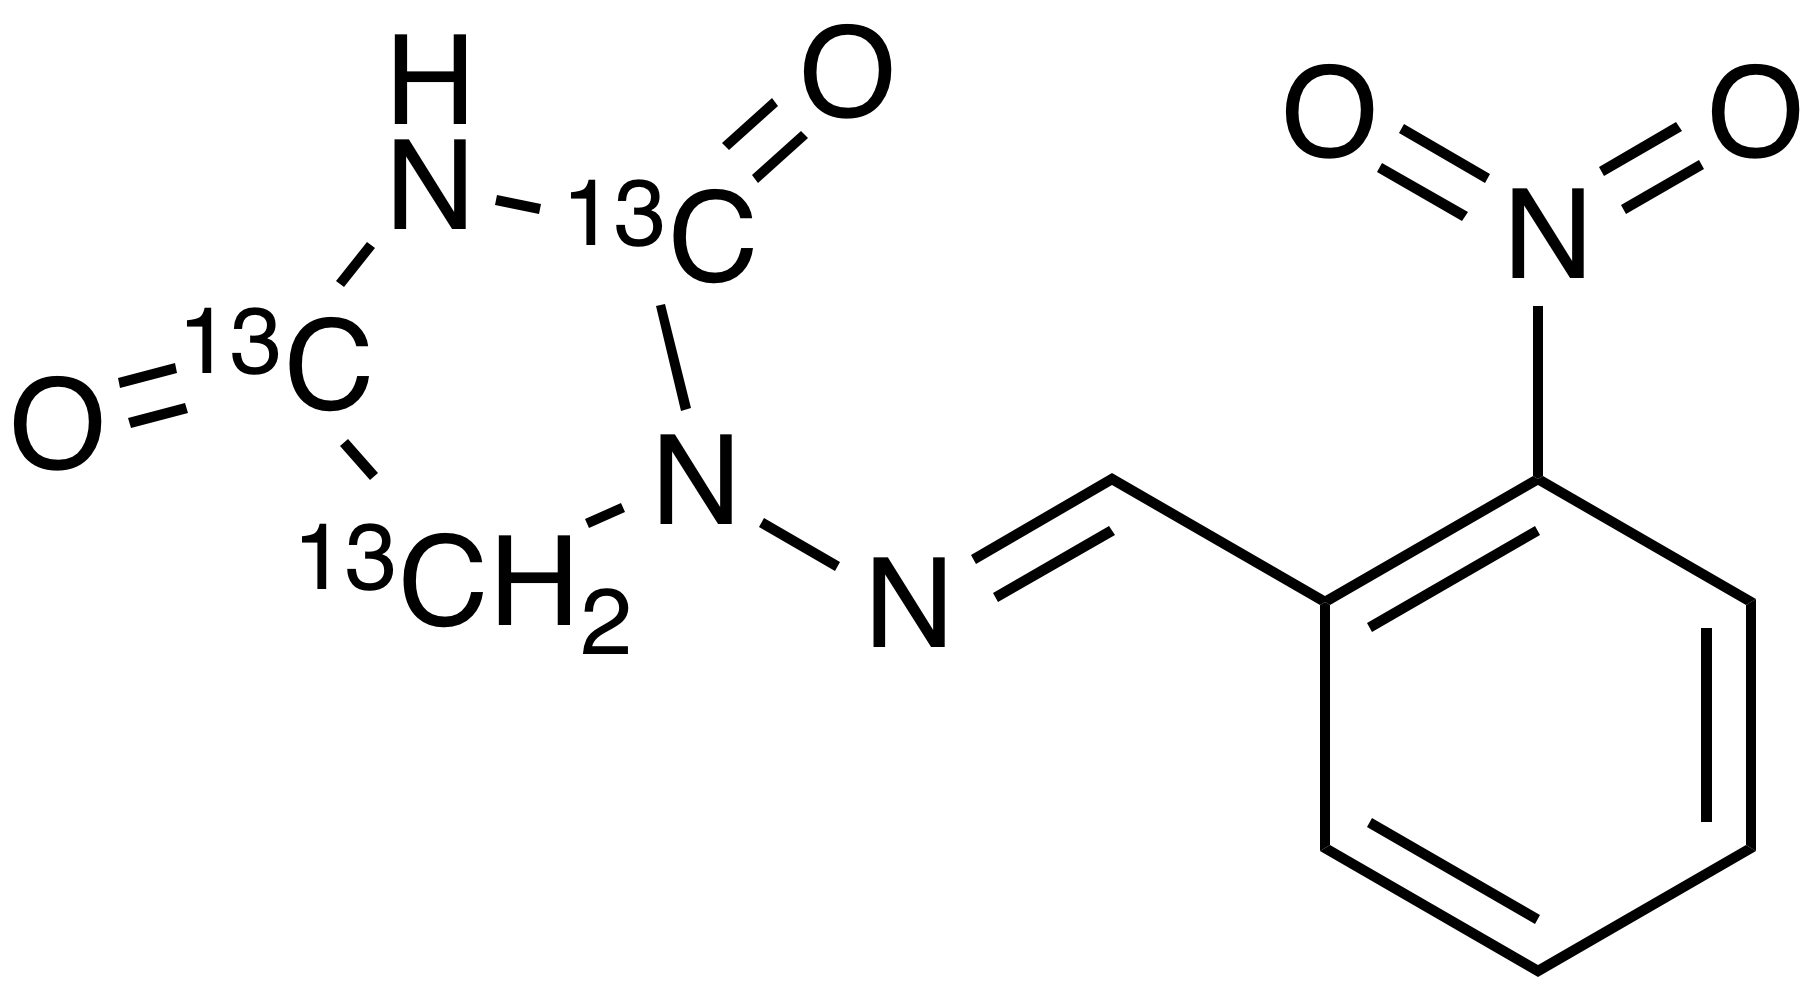 2-NP-AHD-13C3